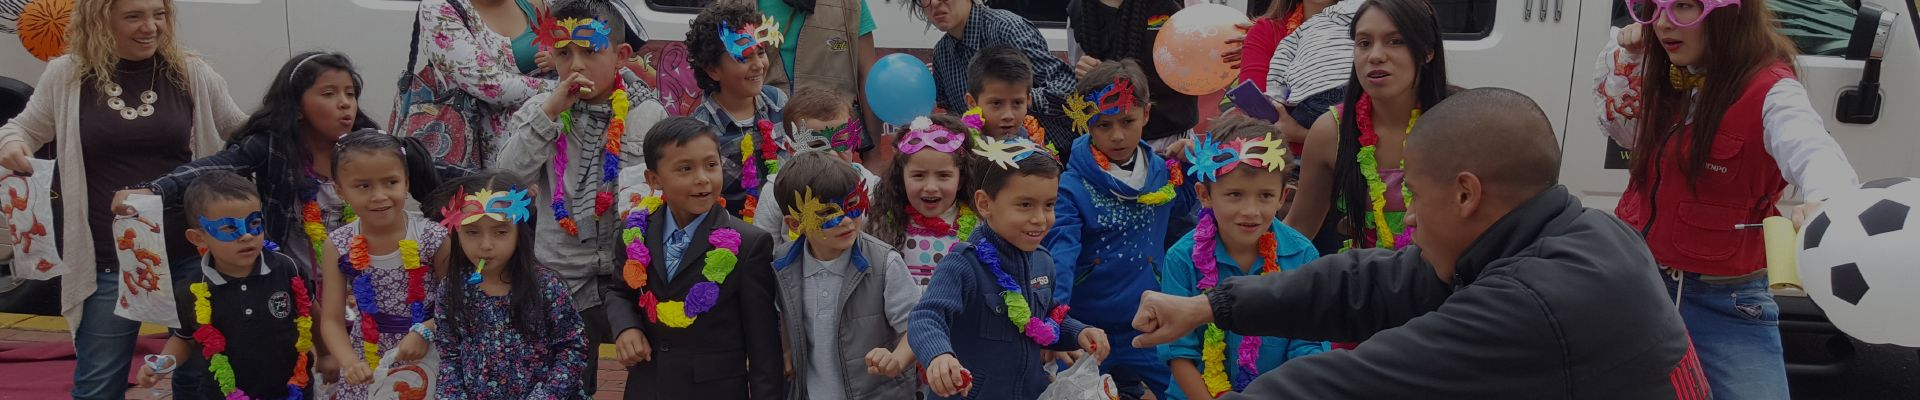 Alquiler limusinas barcelona fiestas infantiles en for Local fiestas infantiles barcelona